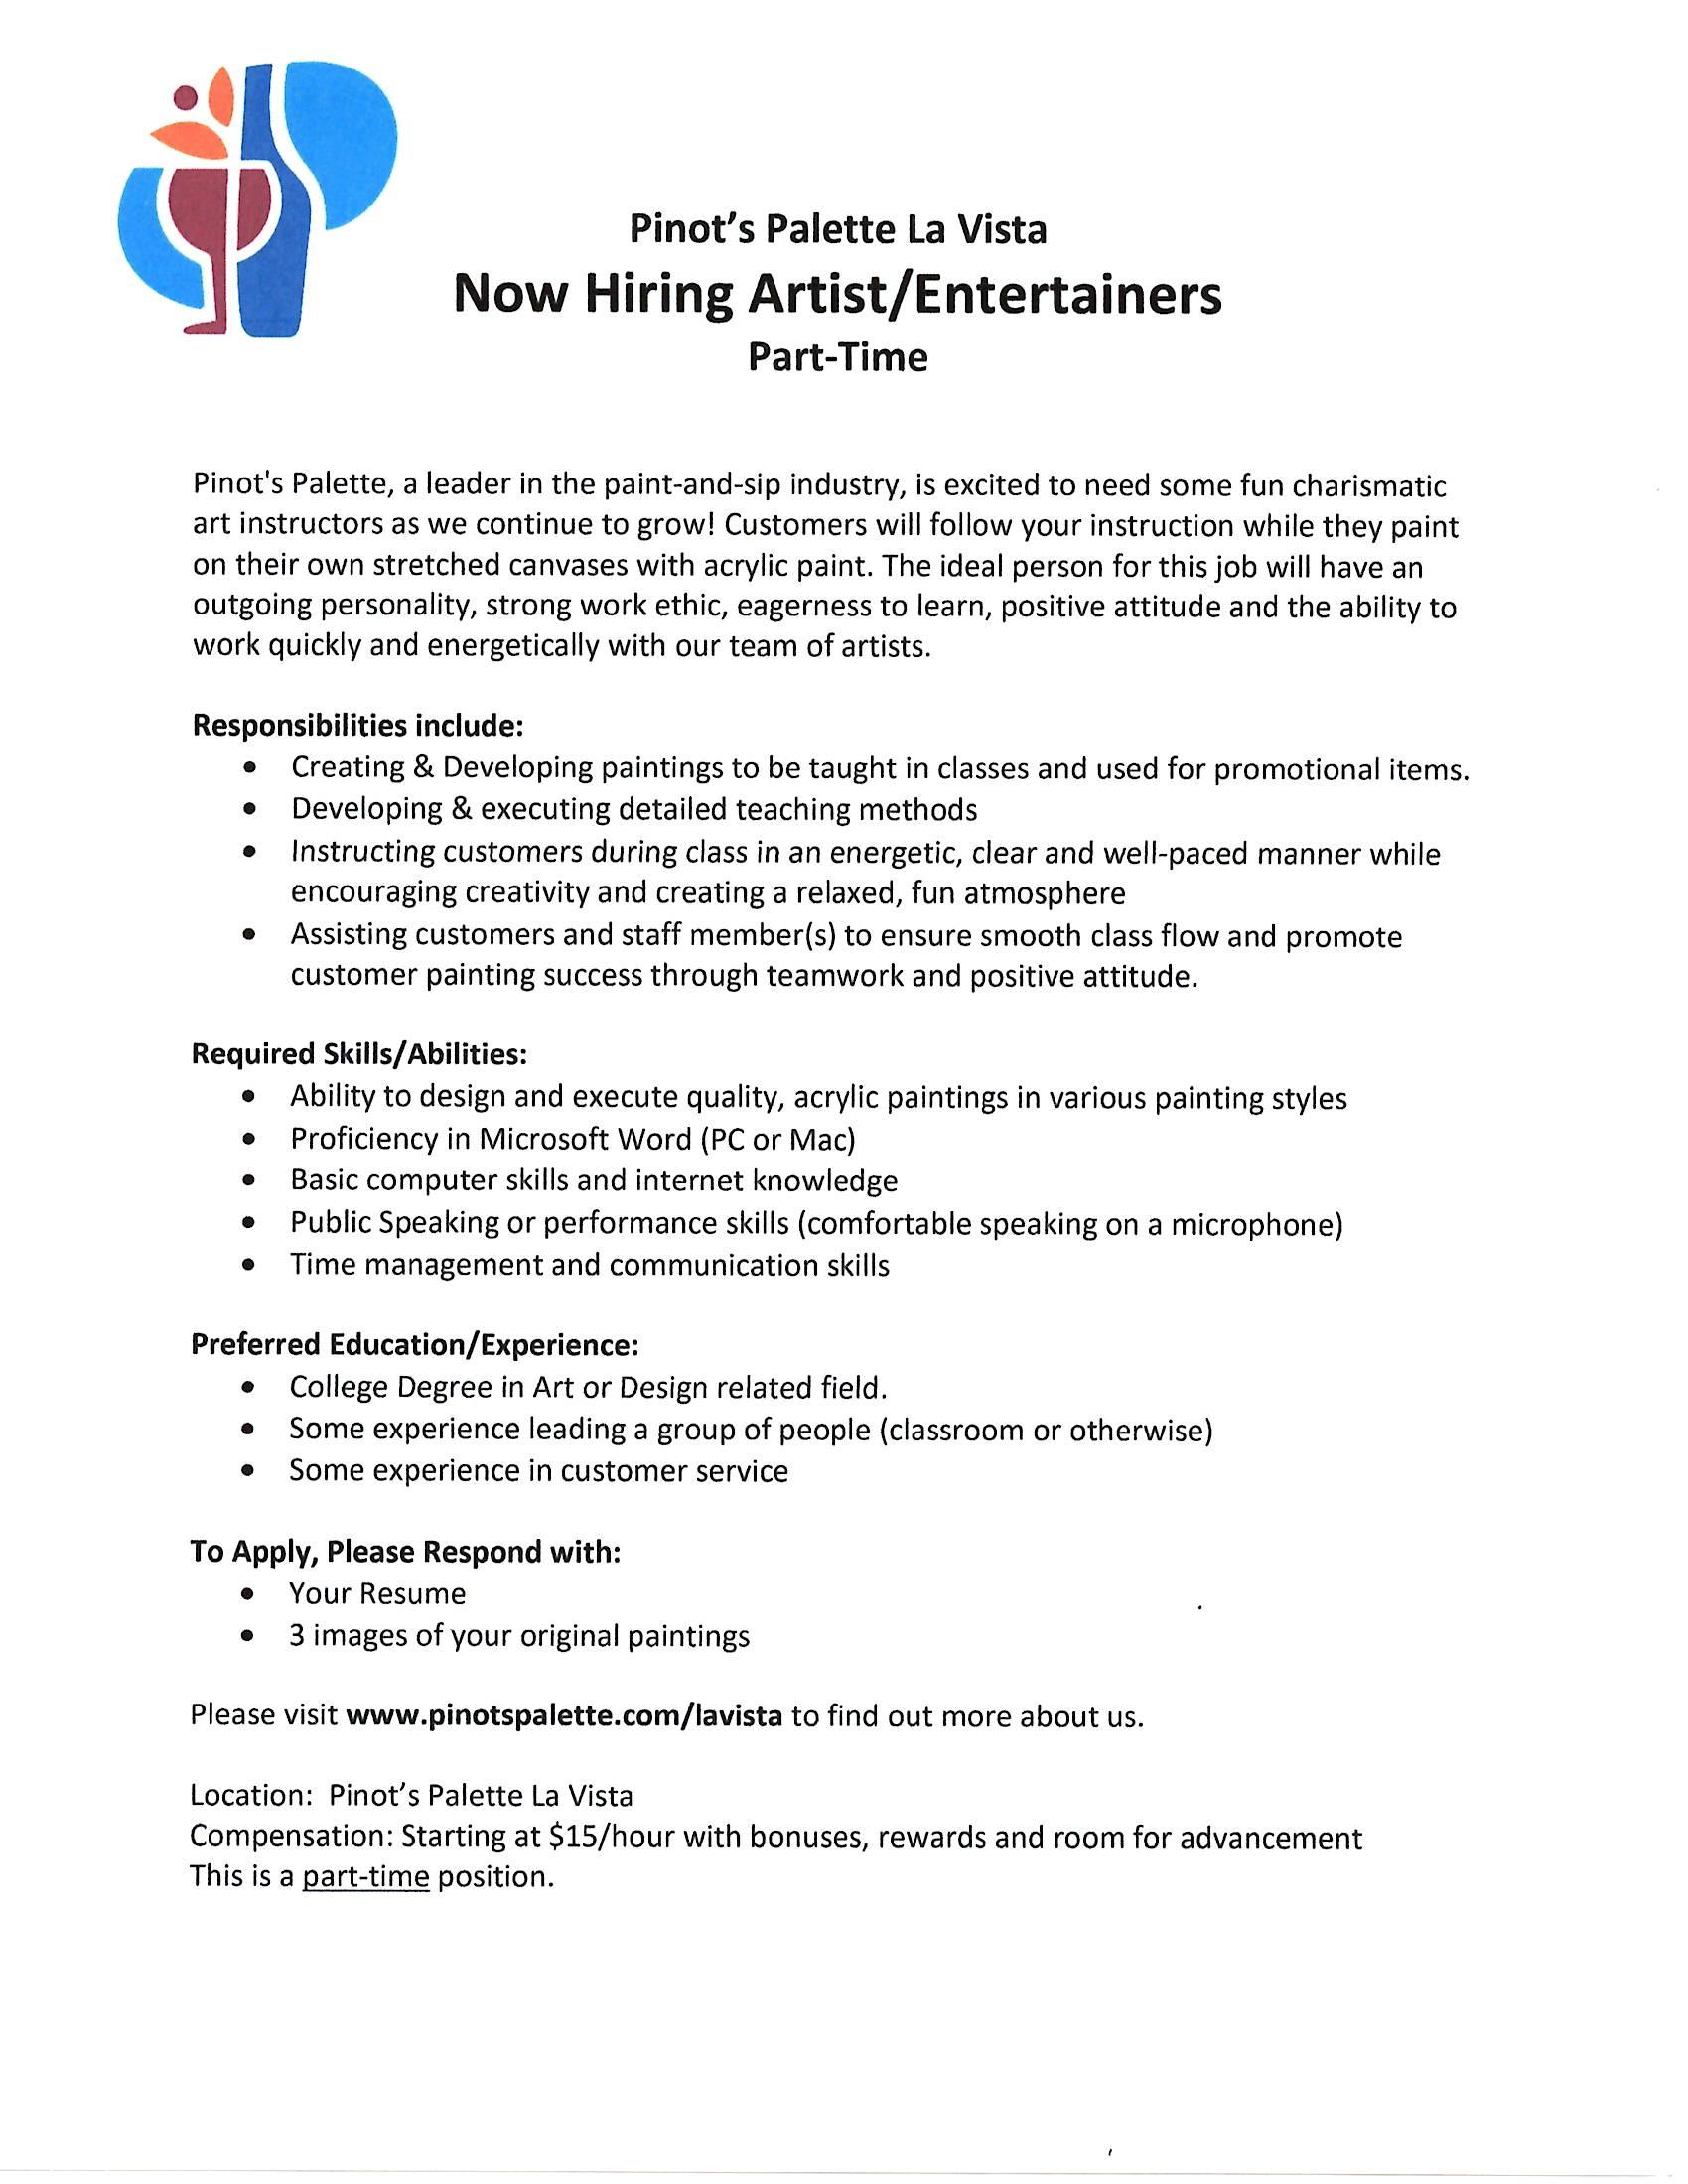 Artist/Entertainer Job Posting